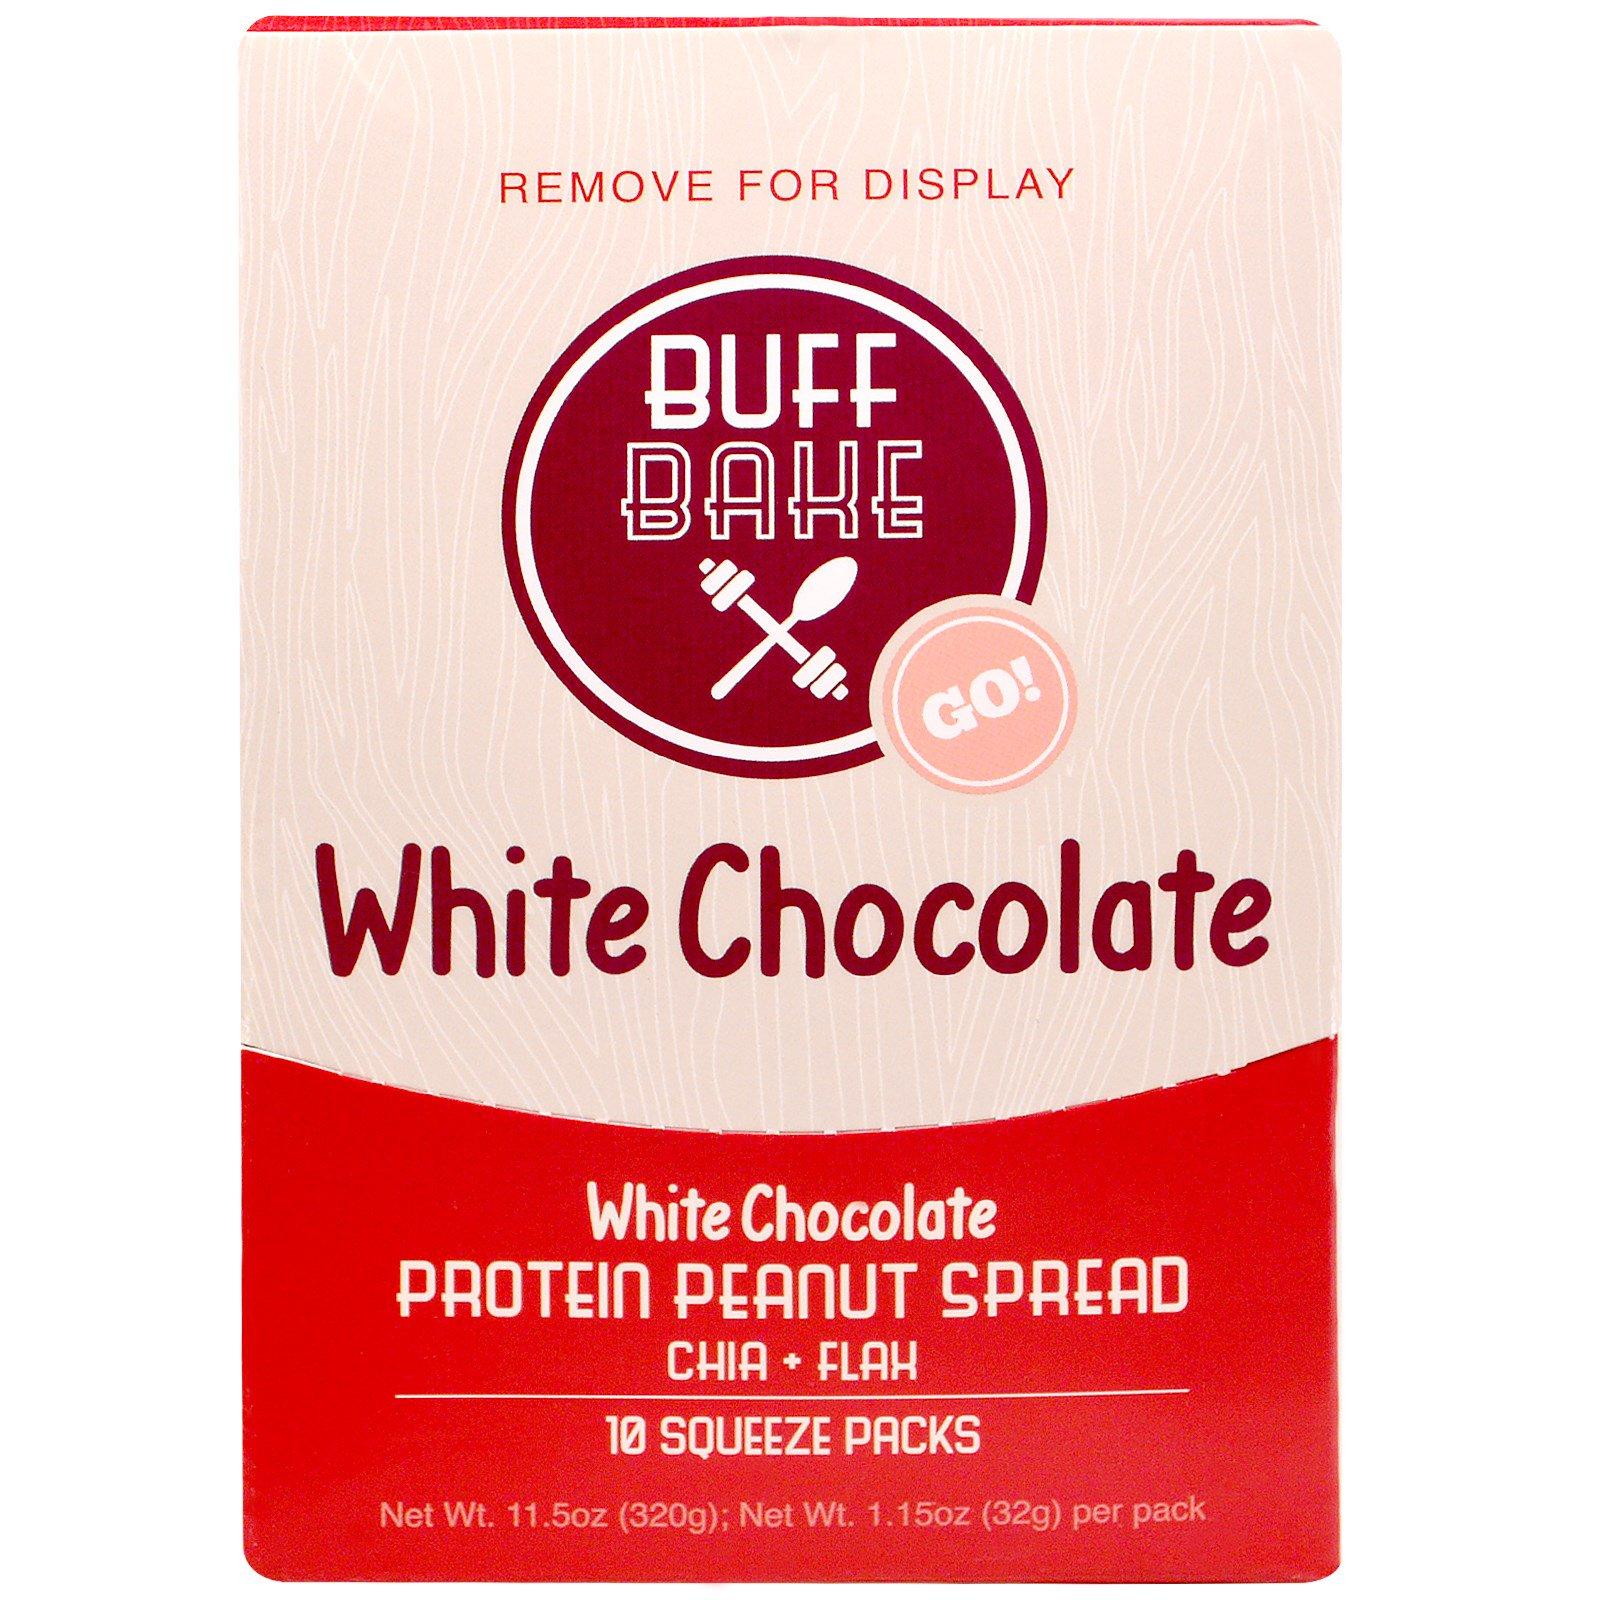 Buff Bake, White Chocolate Протеиновая Миндальная Намазка, 10 Сжимаемых пакетов, по 1,15 унции (32 г) каждый